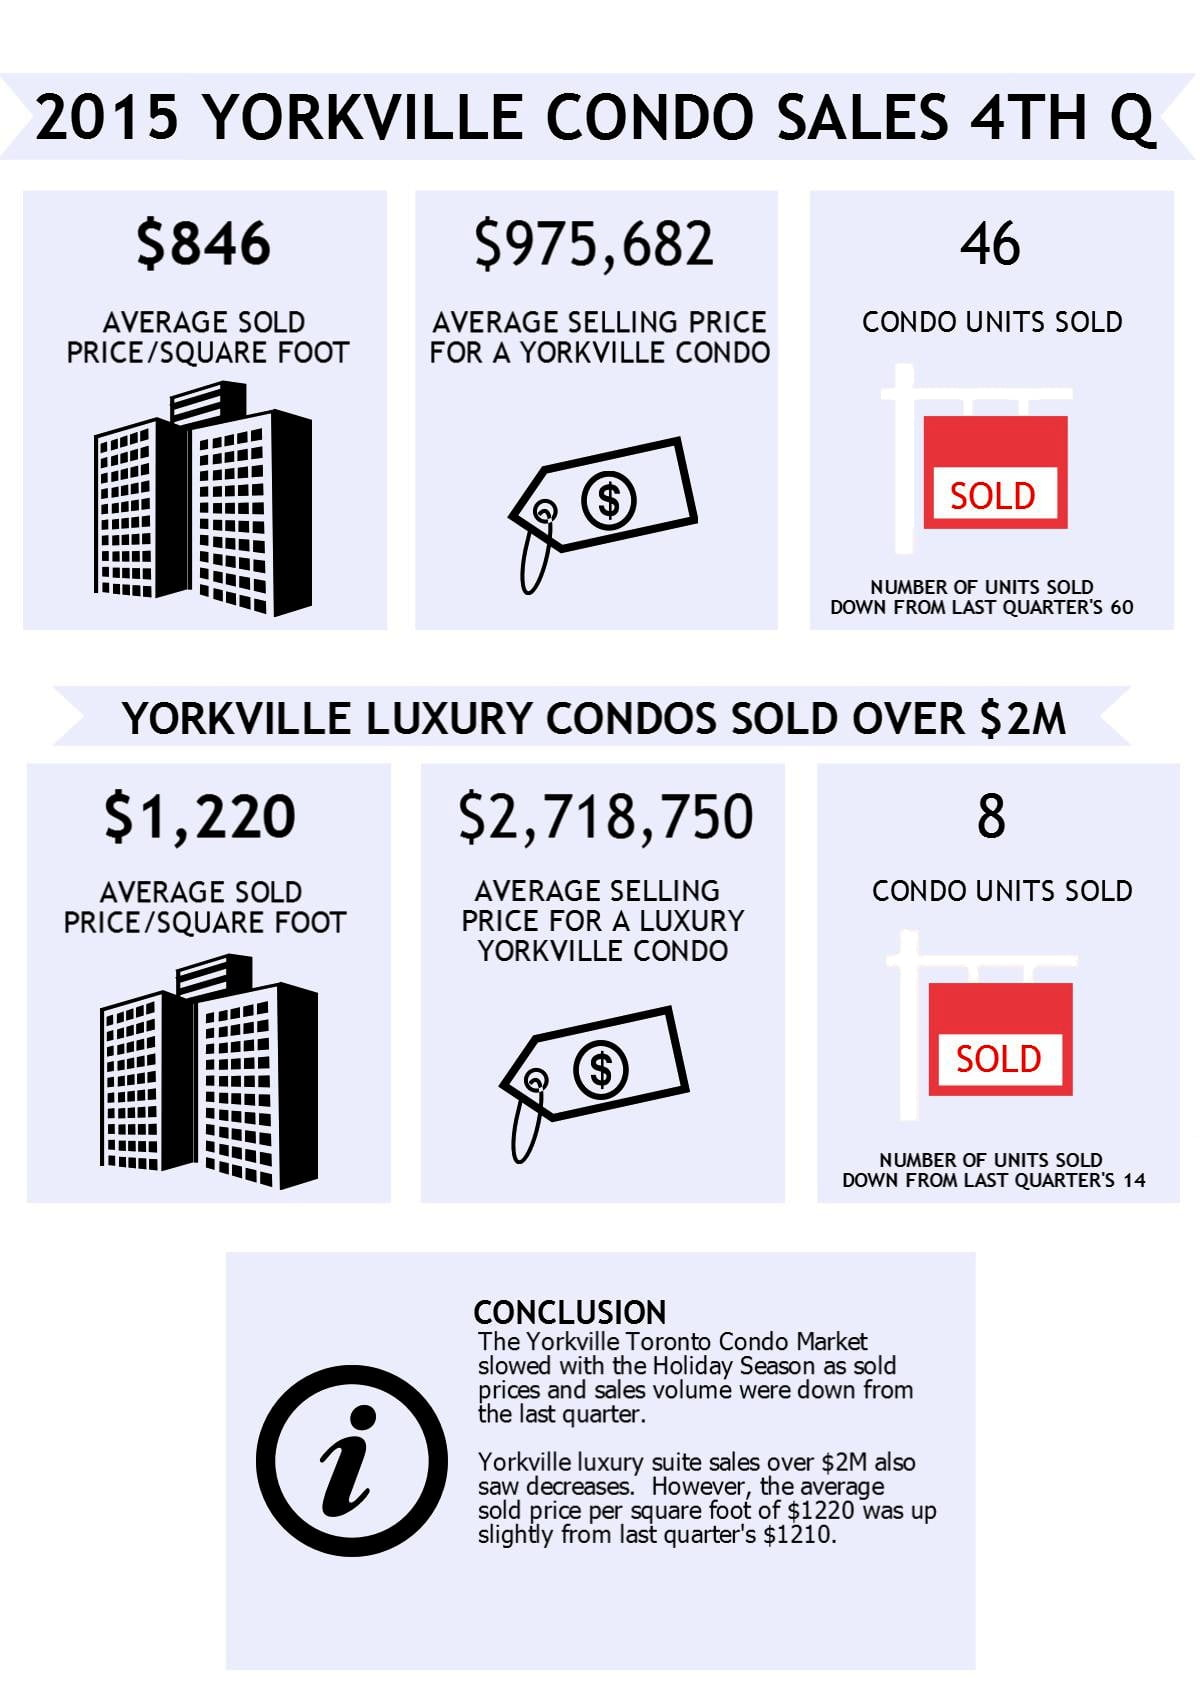 The Yorkville Toronto Condo Market slows down with the Holiday Season